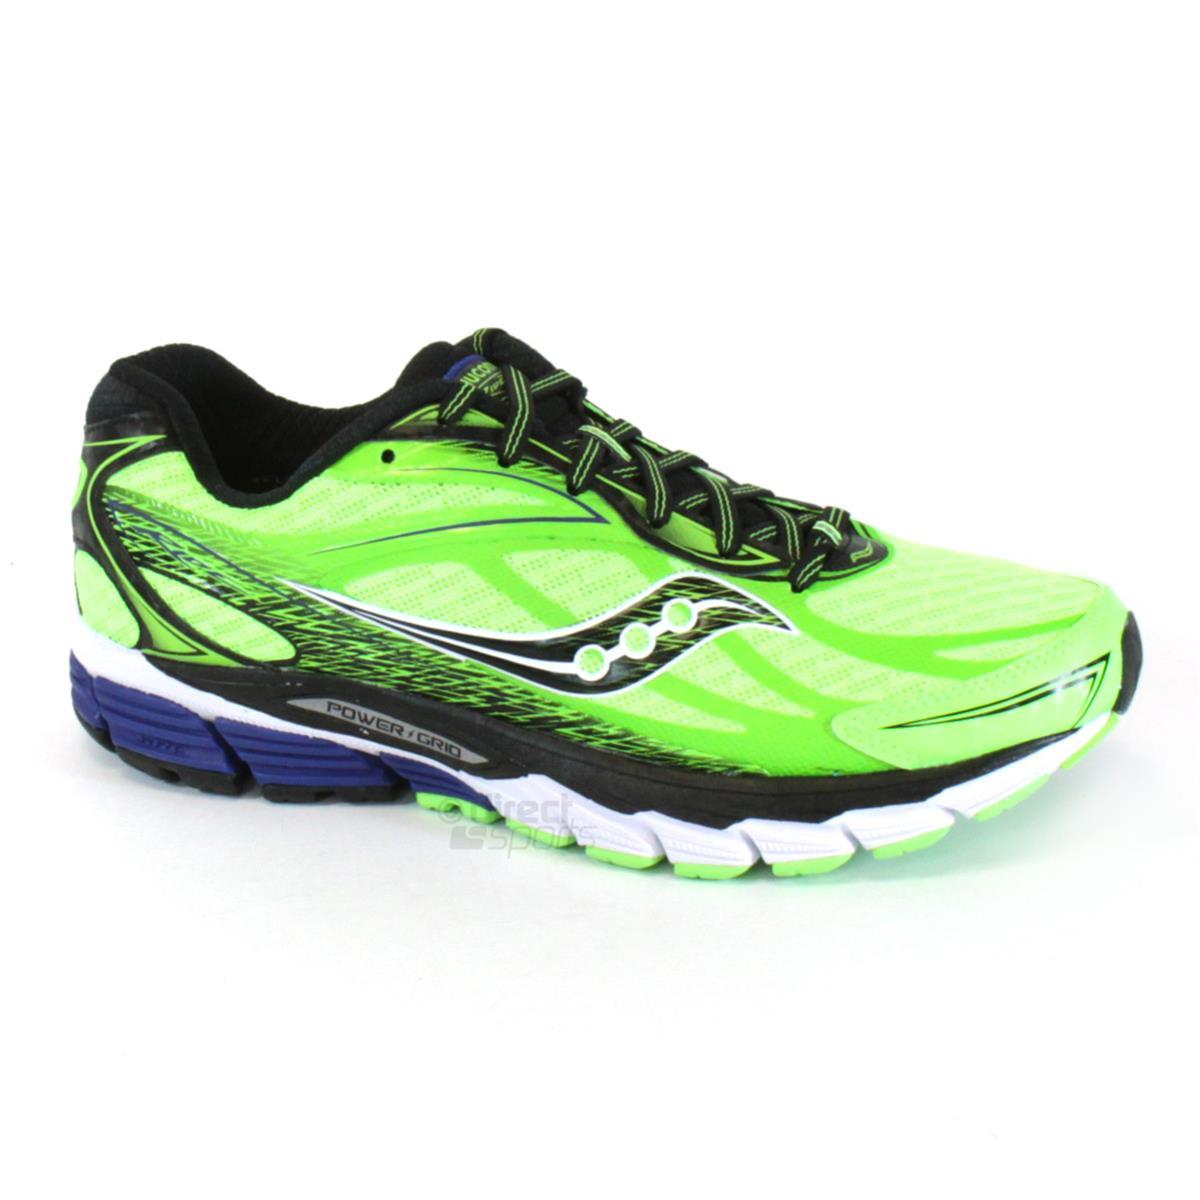 0dabb981918c Saucony Ride 8 Mens Running Shoes (Slime-Black-White ...